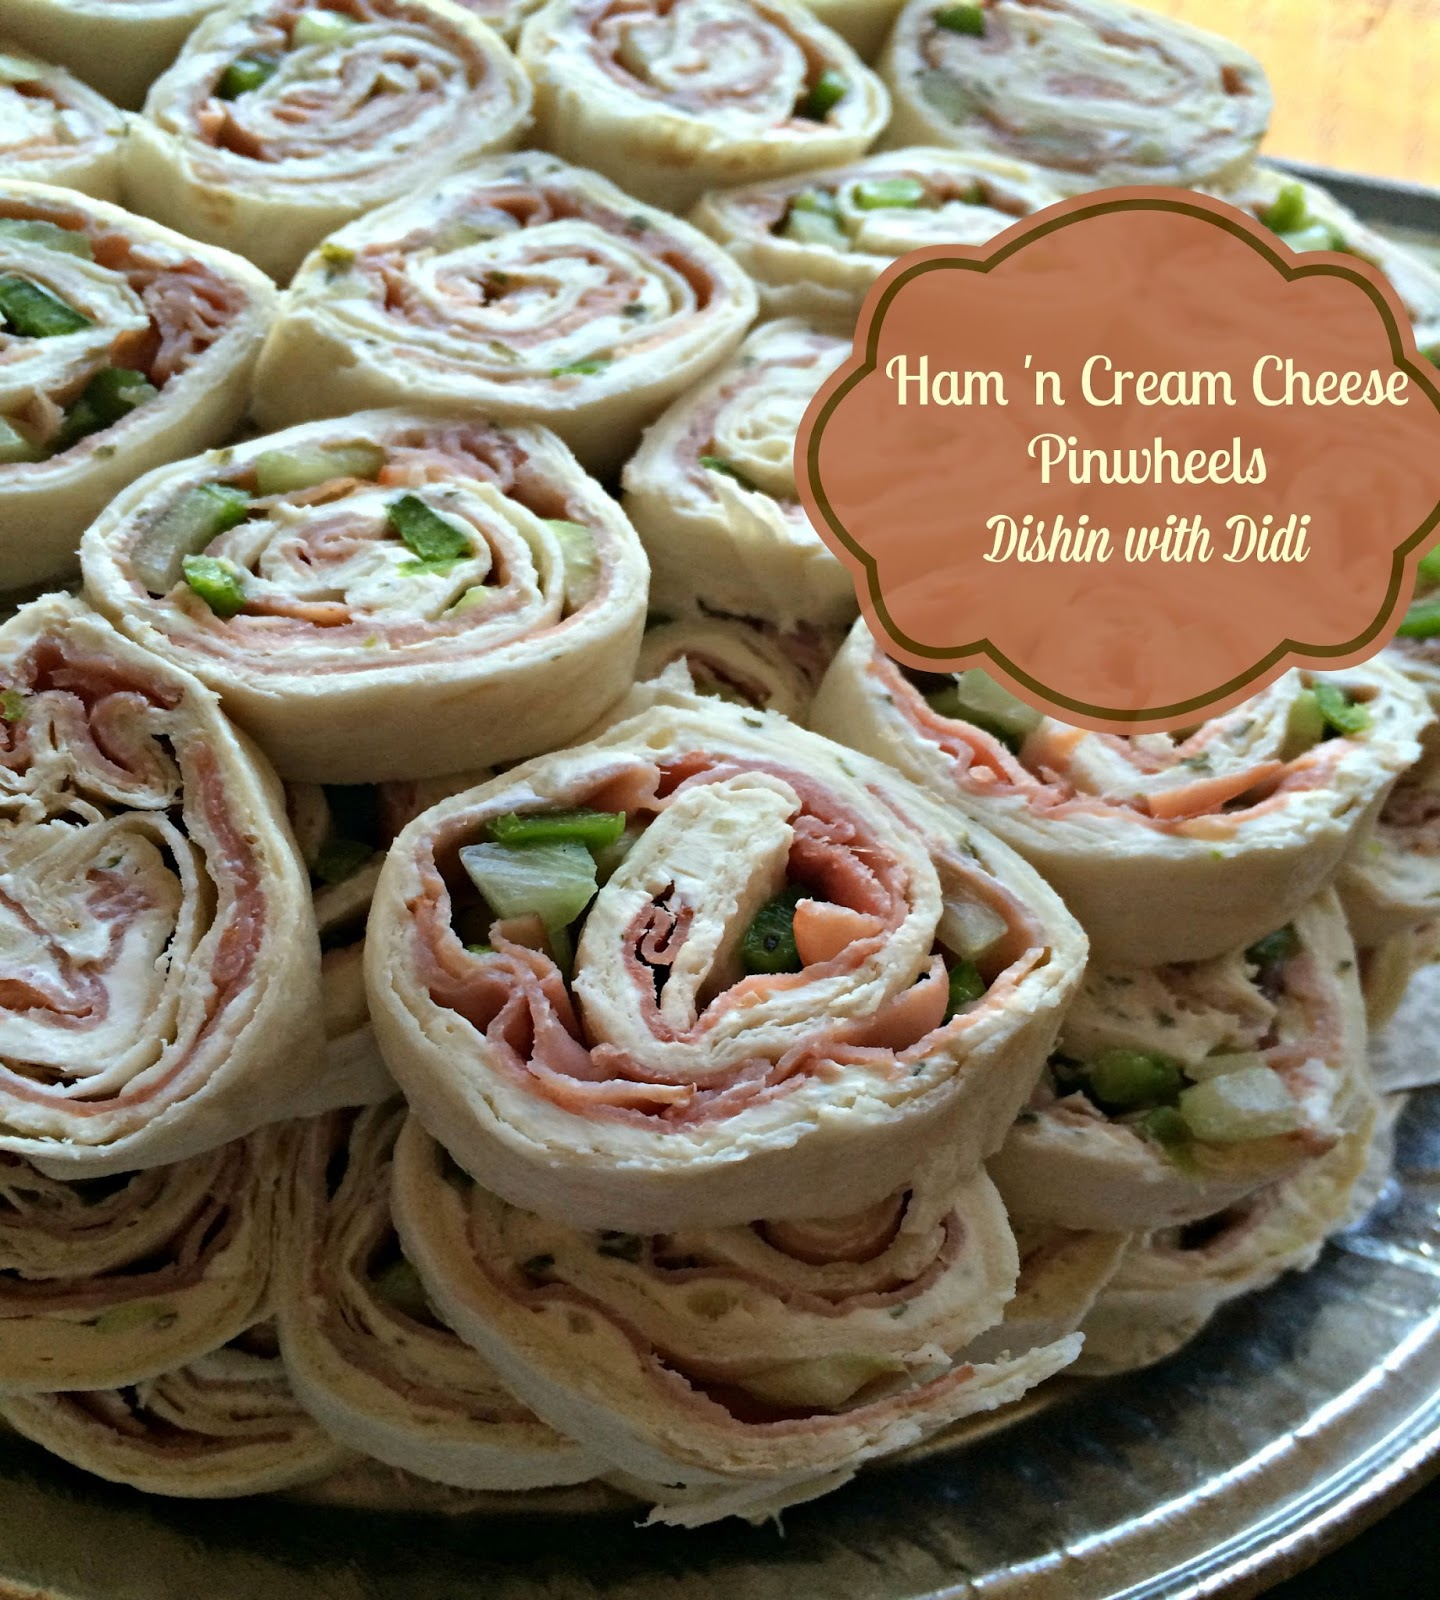 Dishin with Didi: Ham 'n Cream Cheese Pinwheels